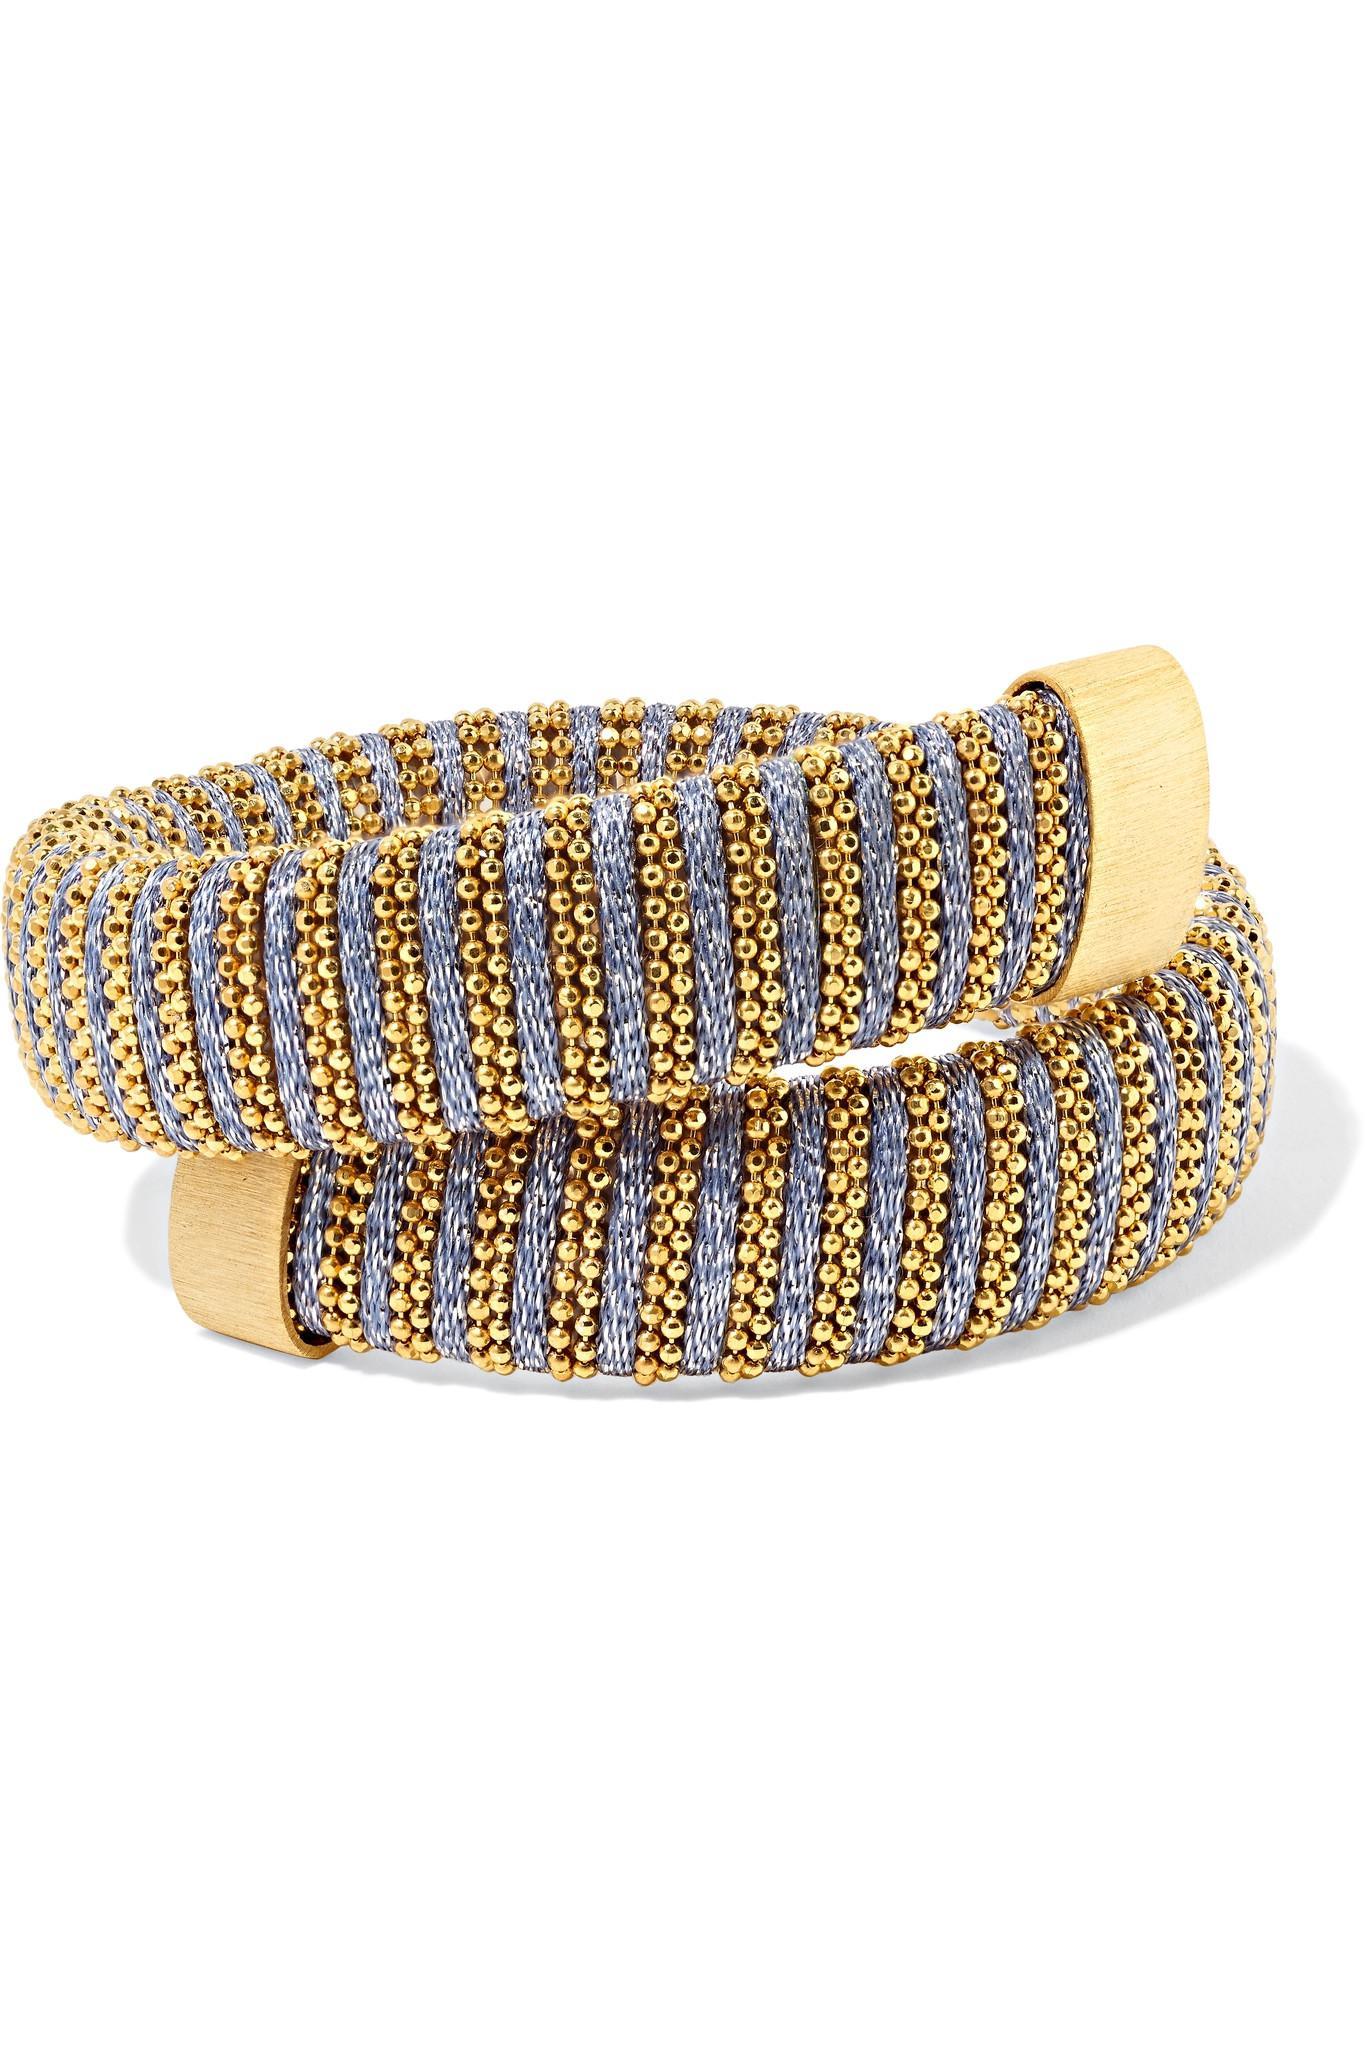 Carolina Bucci Caro Gold-plated And Metallic Cotton Bracelet XesIa9